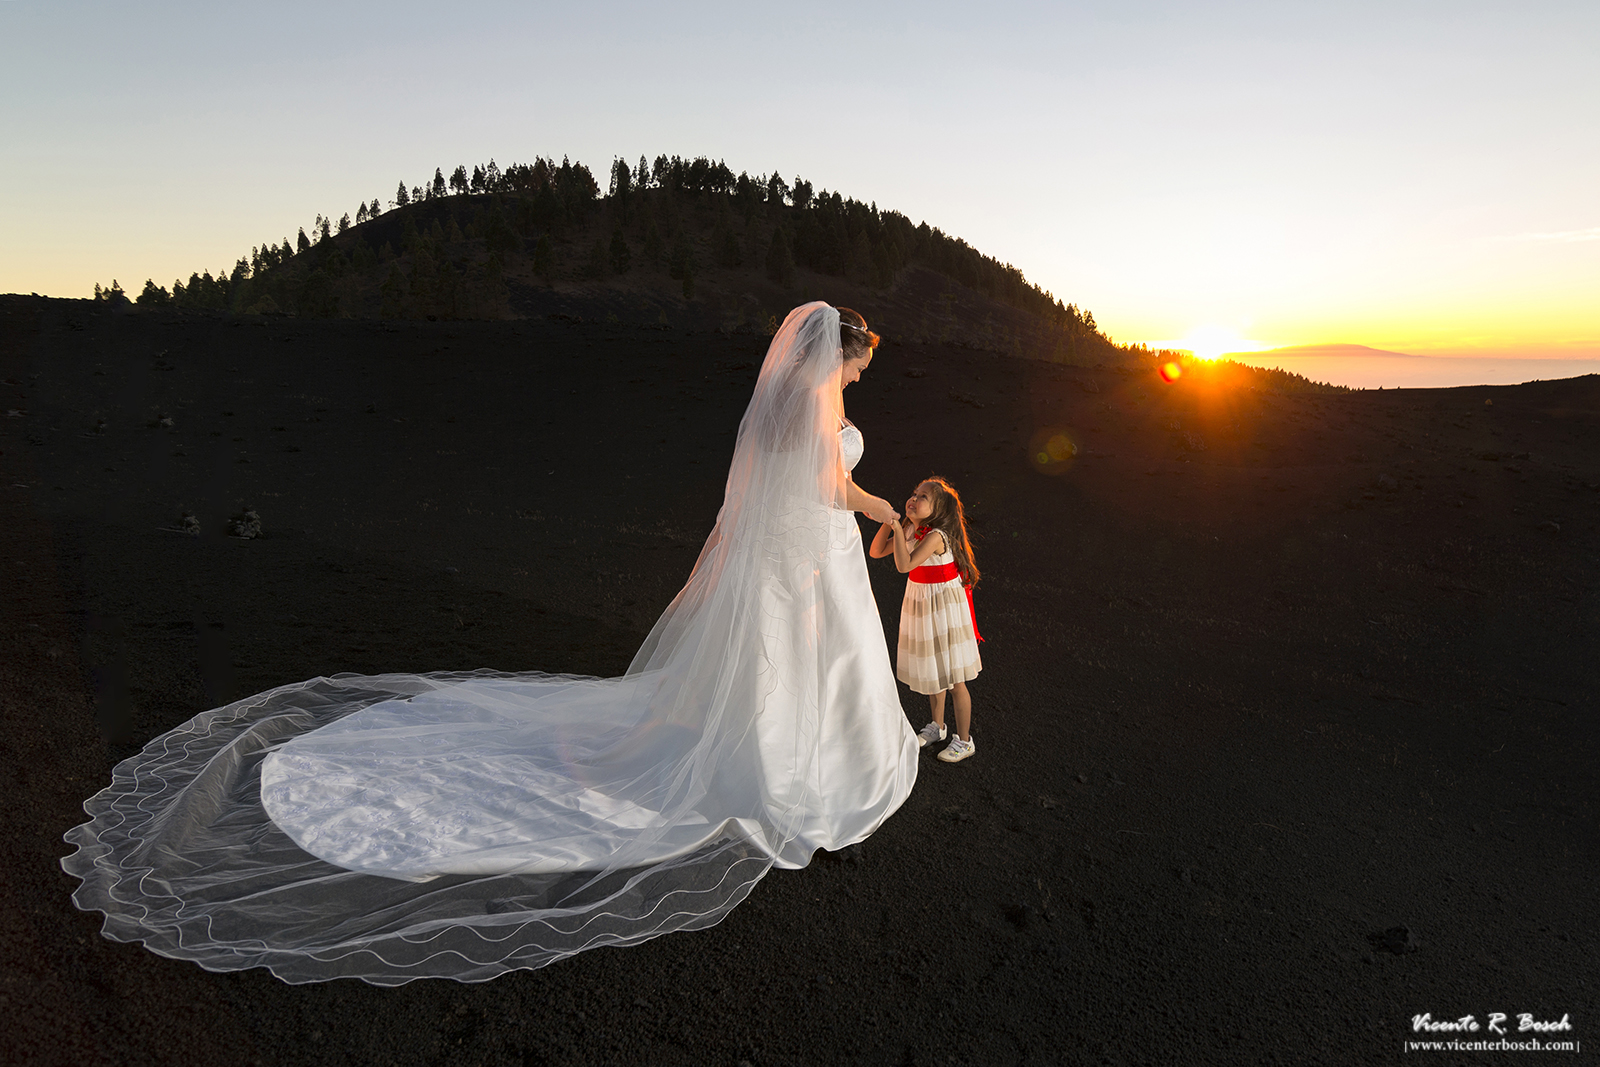 Postboda en Tenerife - Vicente R. Bosch - Fotógrafo boda Tenerife